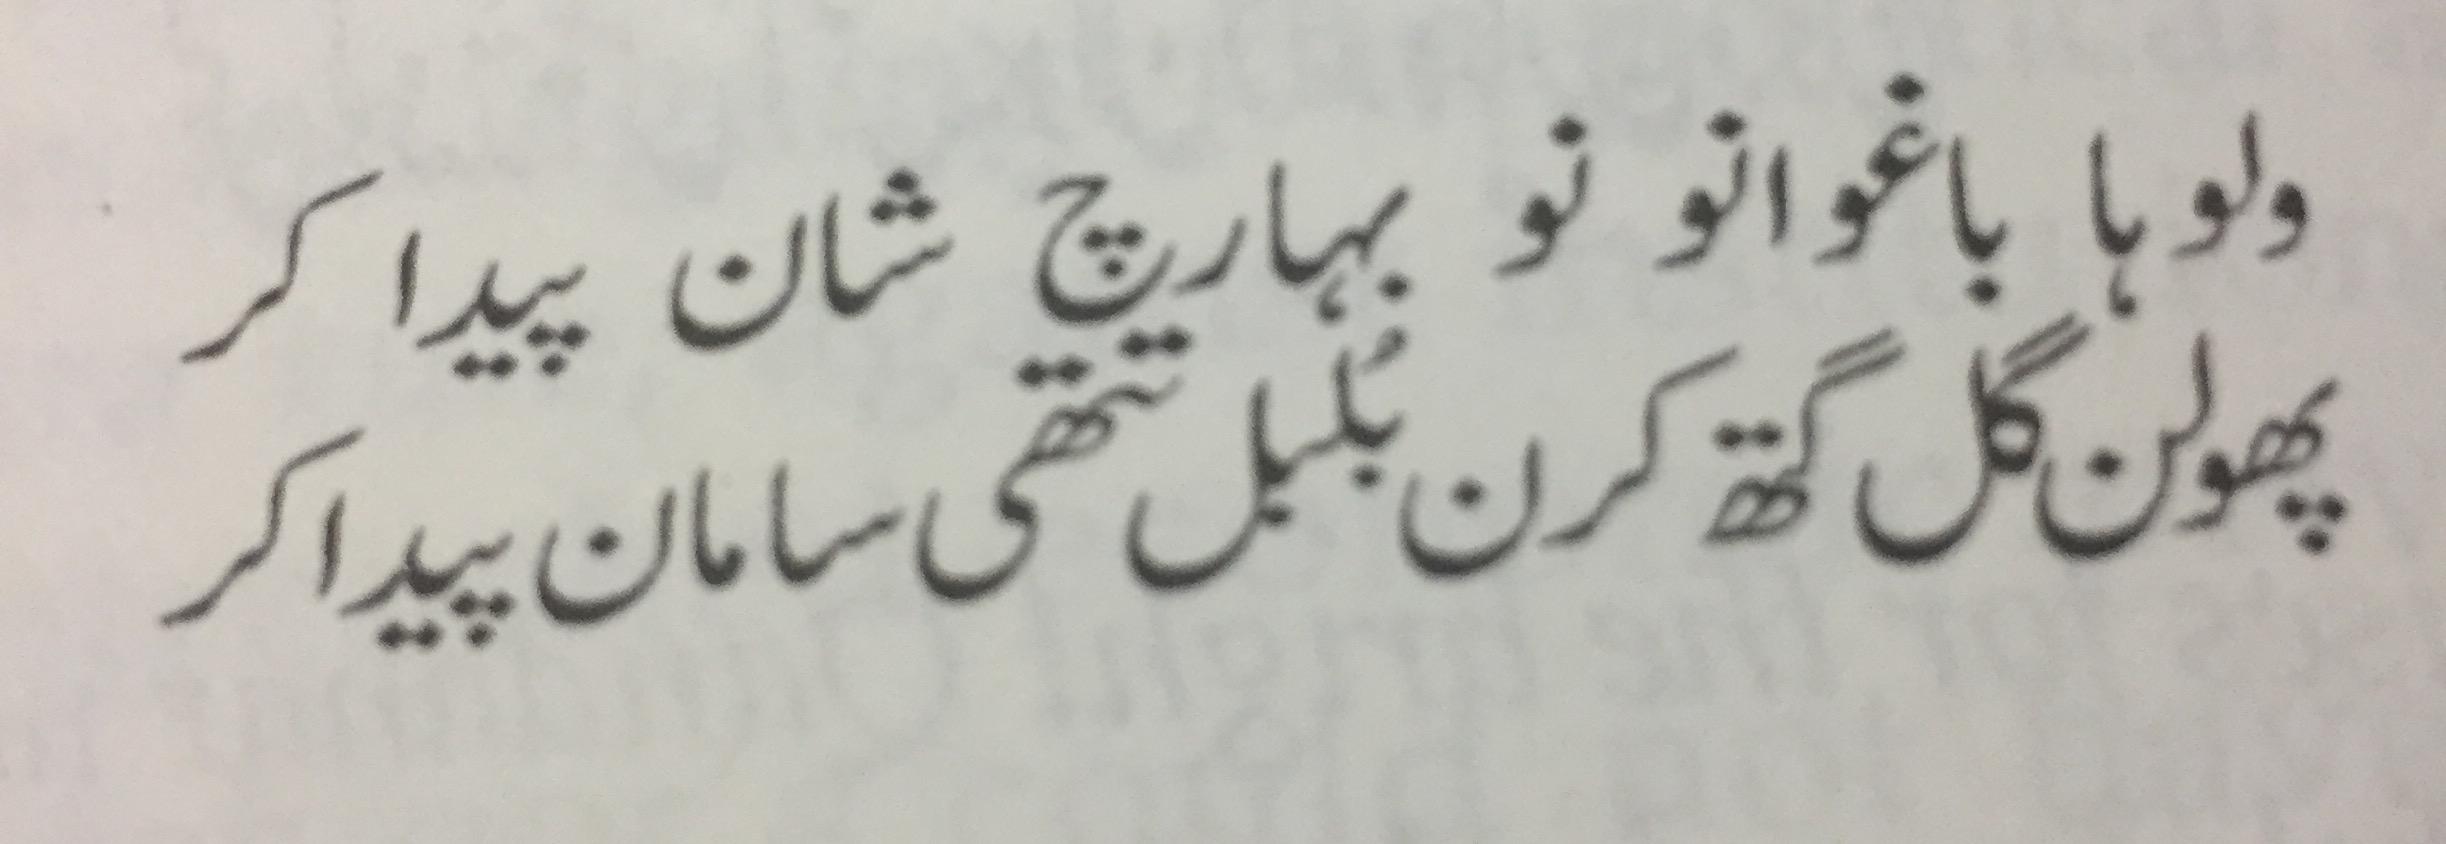 tct-urdu-2